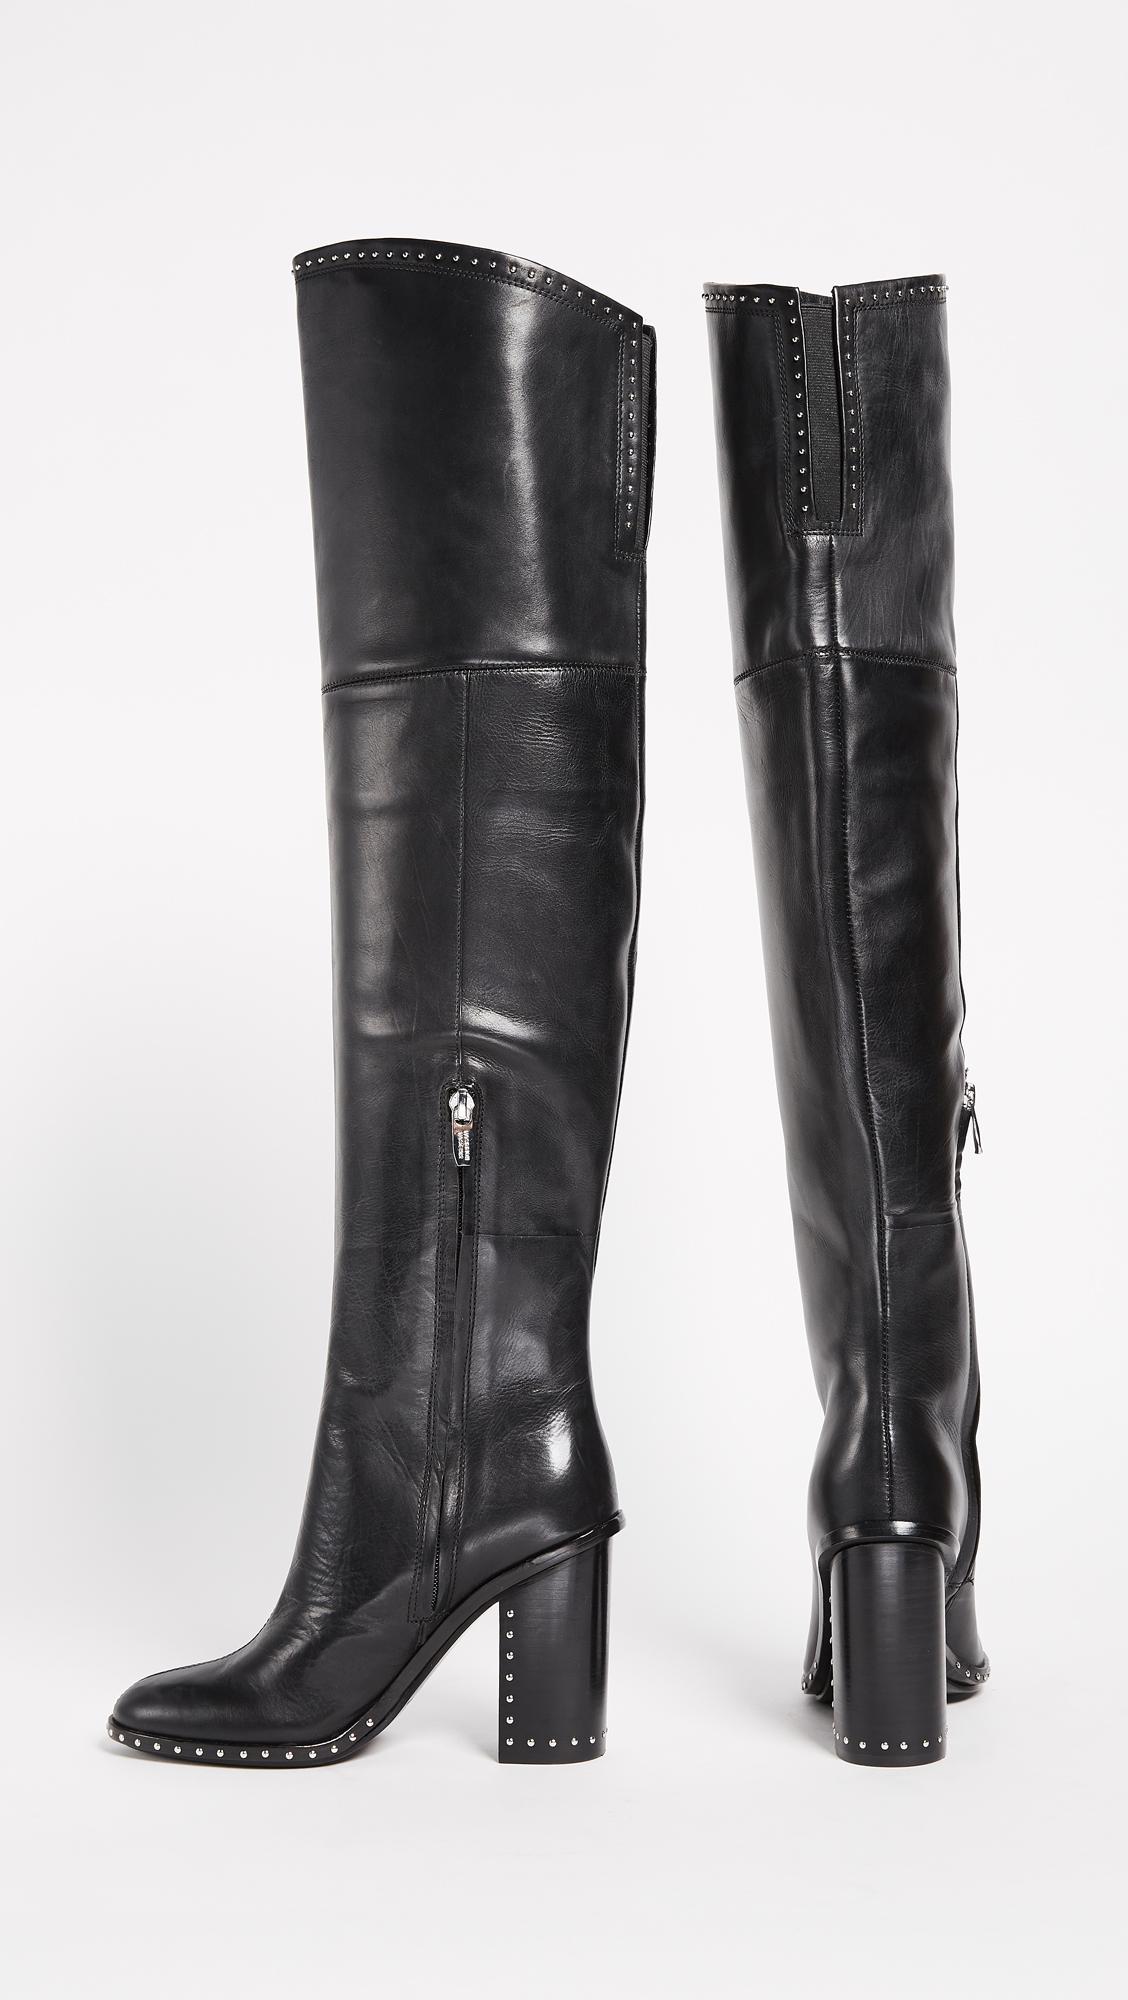 dedbce8bb58 Sigerson Morrison Mars Thigh High Boots